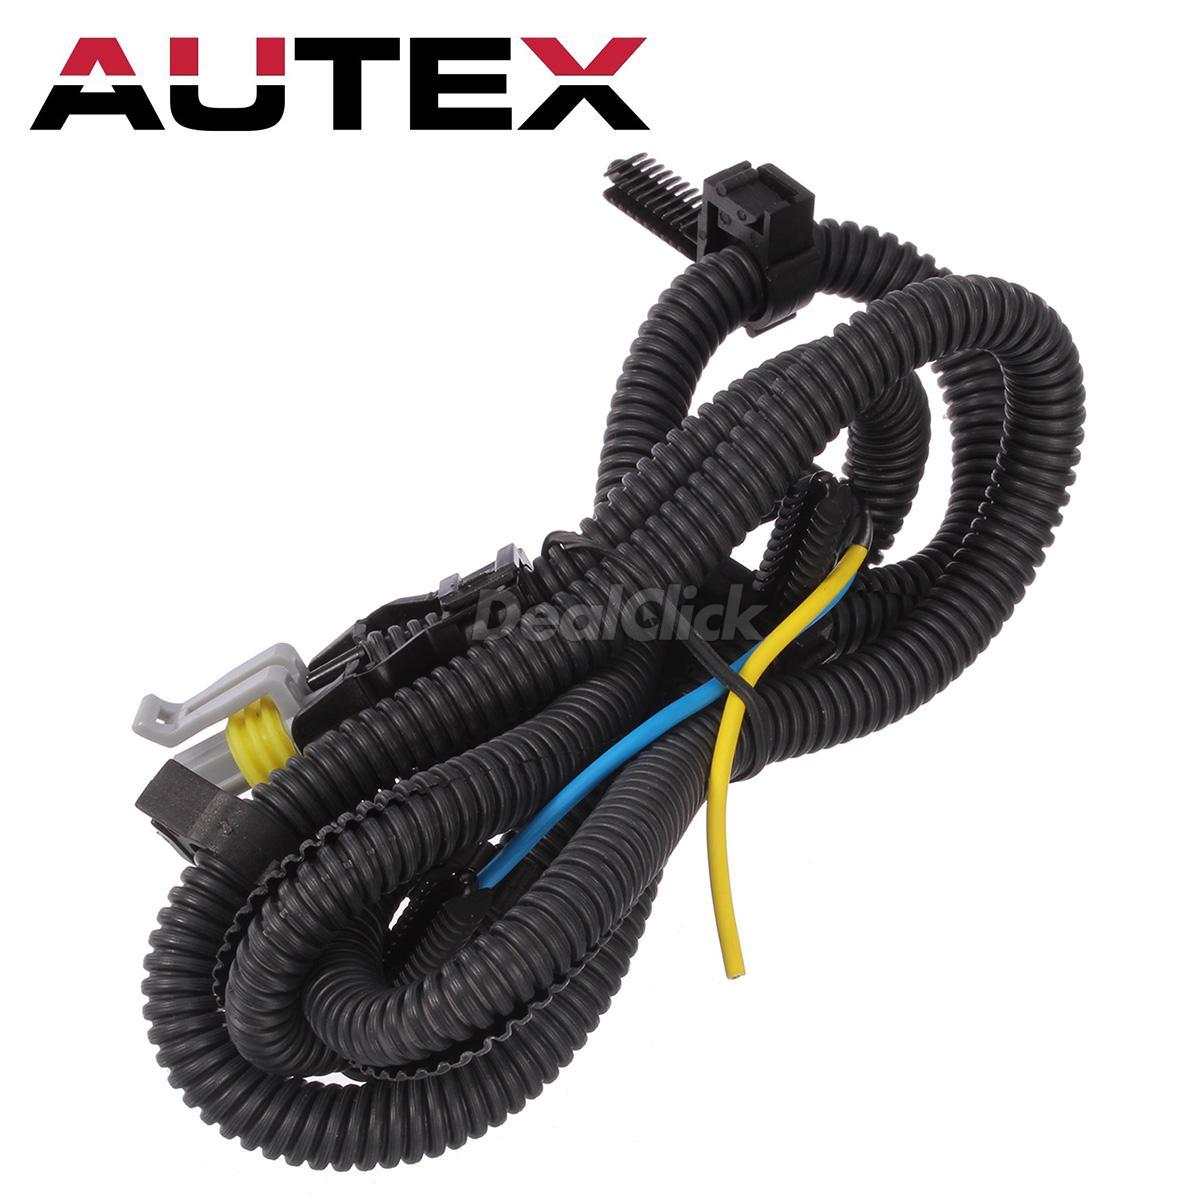 n15002 abs speed sensor harness wire front for 01 2005 pontiac aztek grand prix ebay